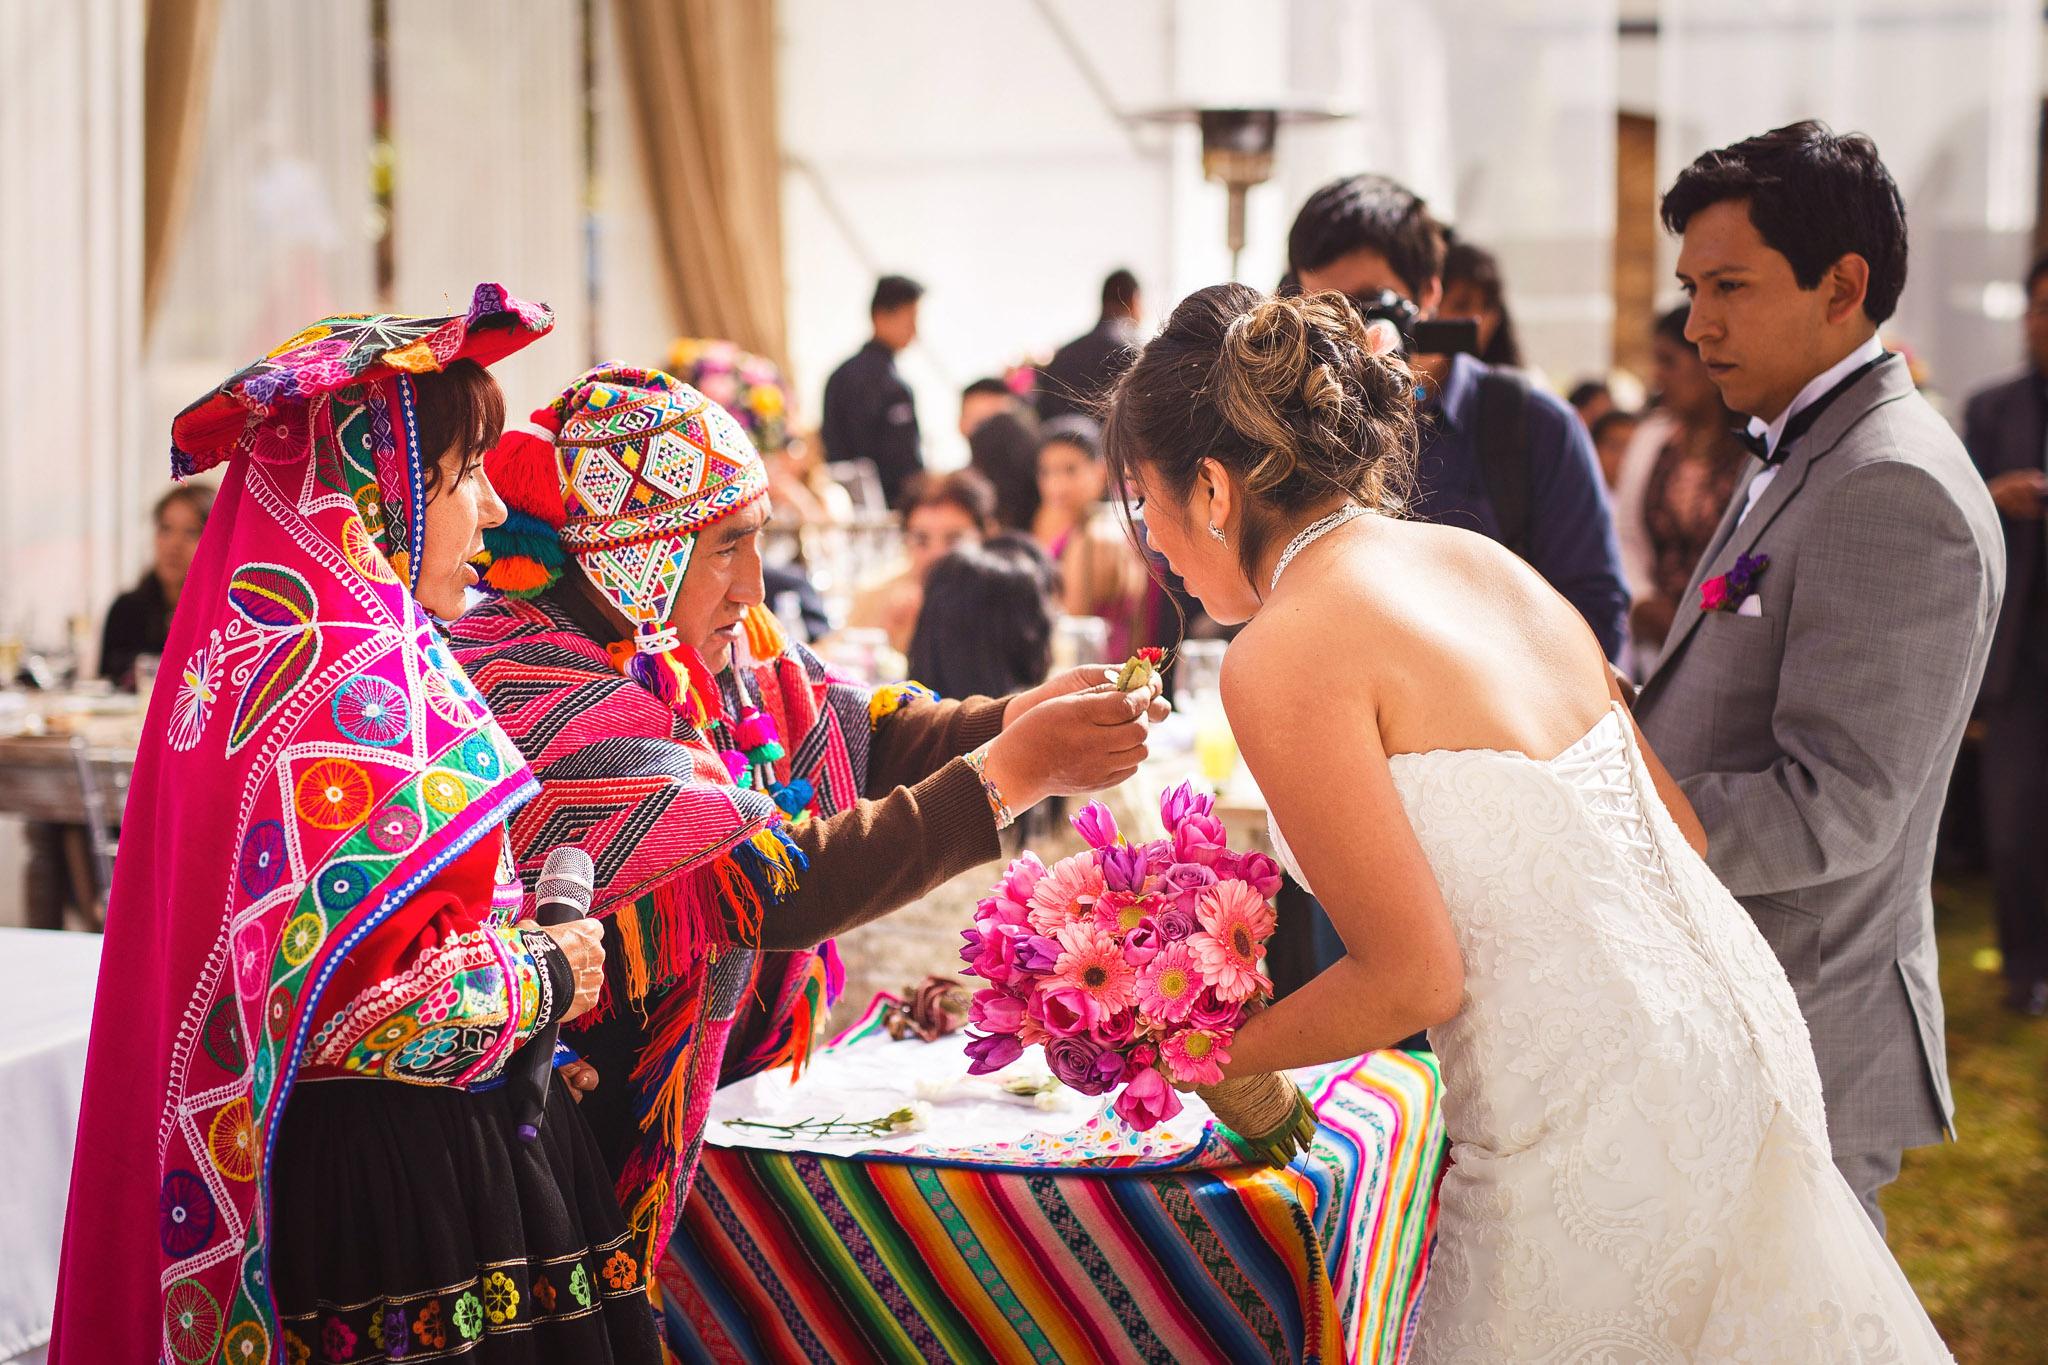 Wedding-Travellers-Destination-Wedding-Peru-Cusco-Hacienda-Sarapampa-Sacred-Valley-traditional-andean-ceremony-koka-kintu-coca-leafs-wishes